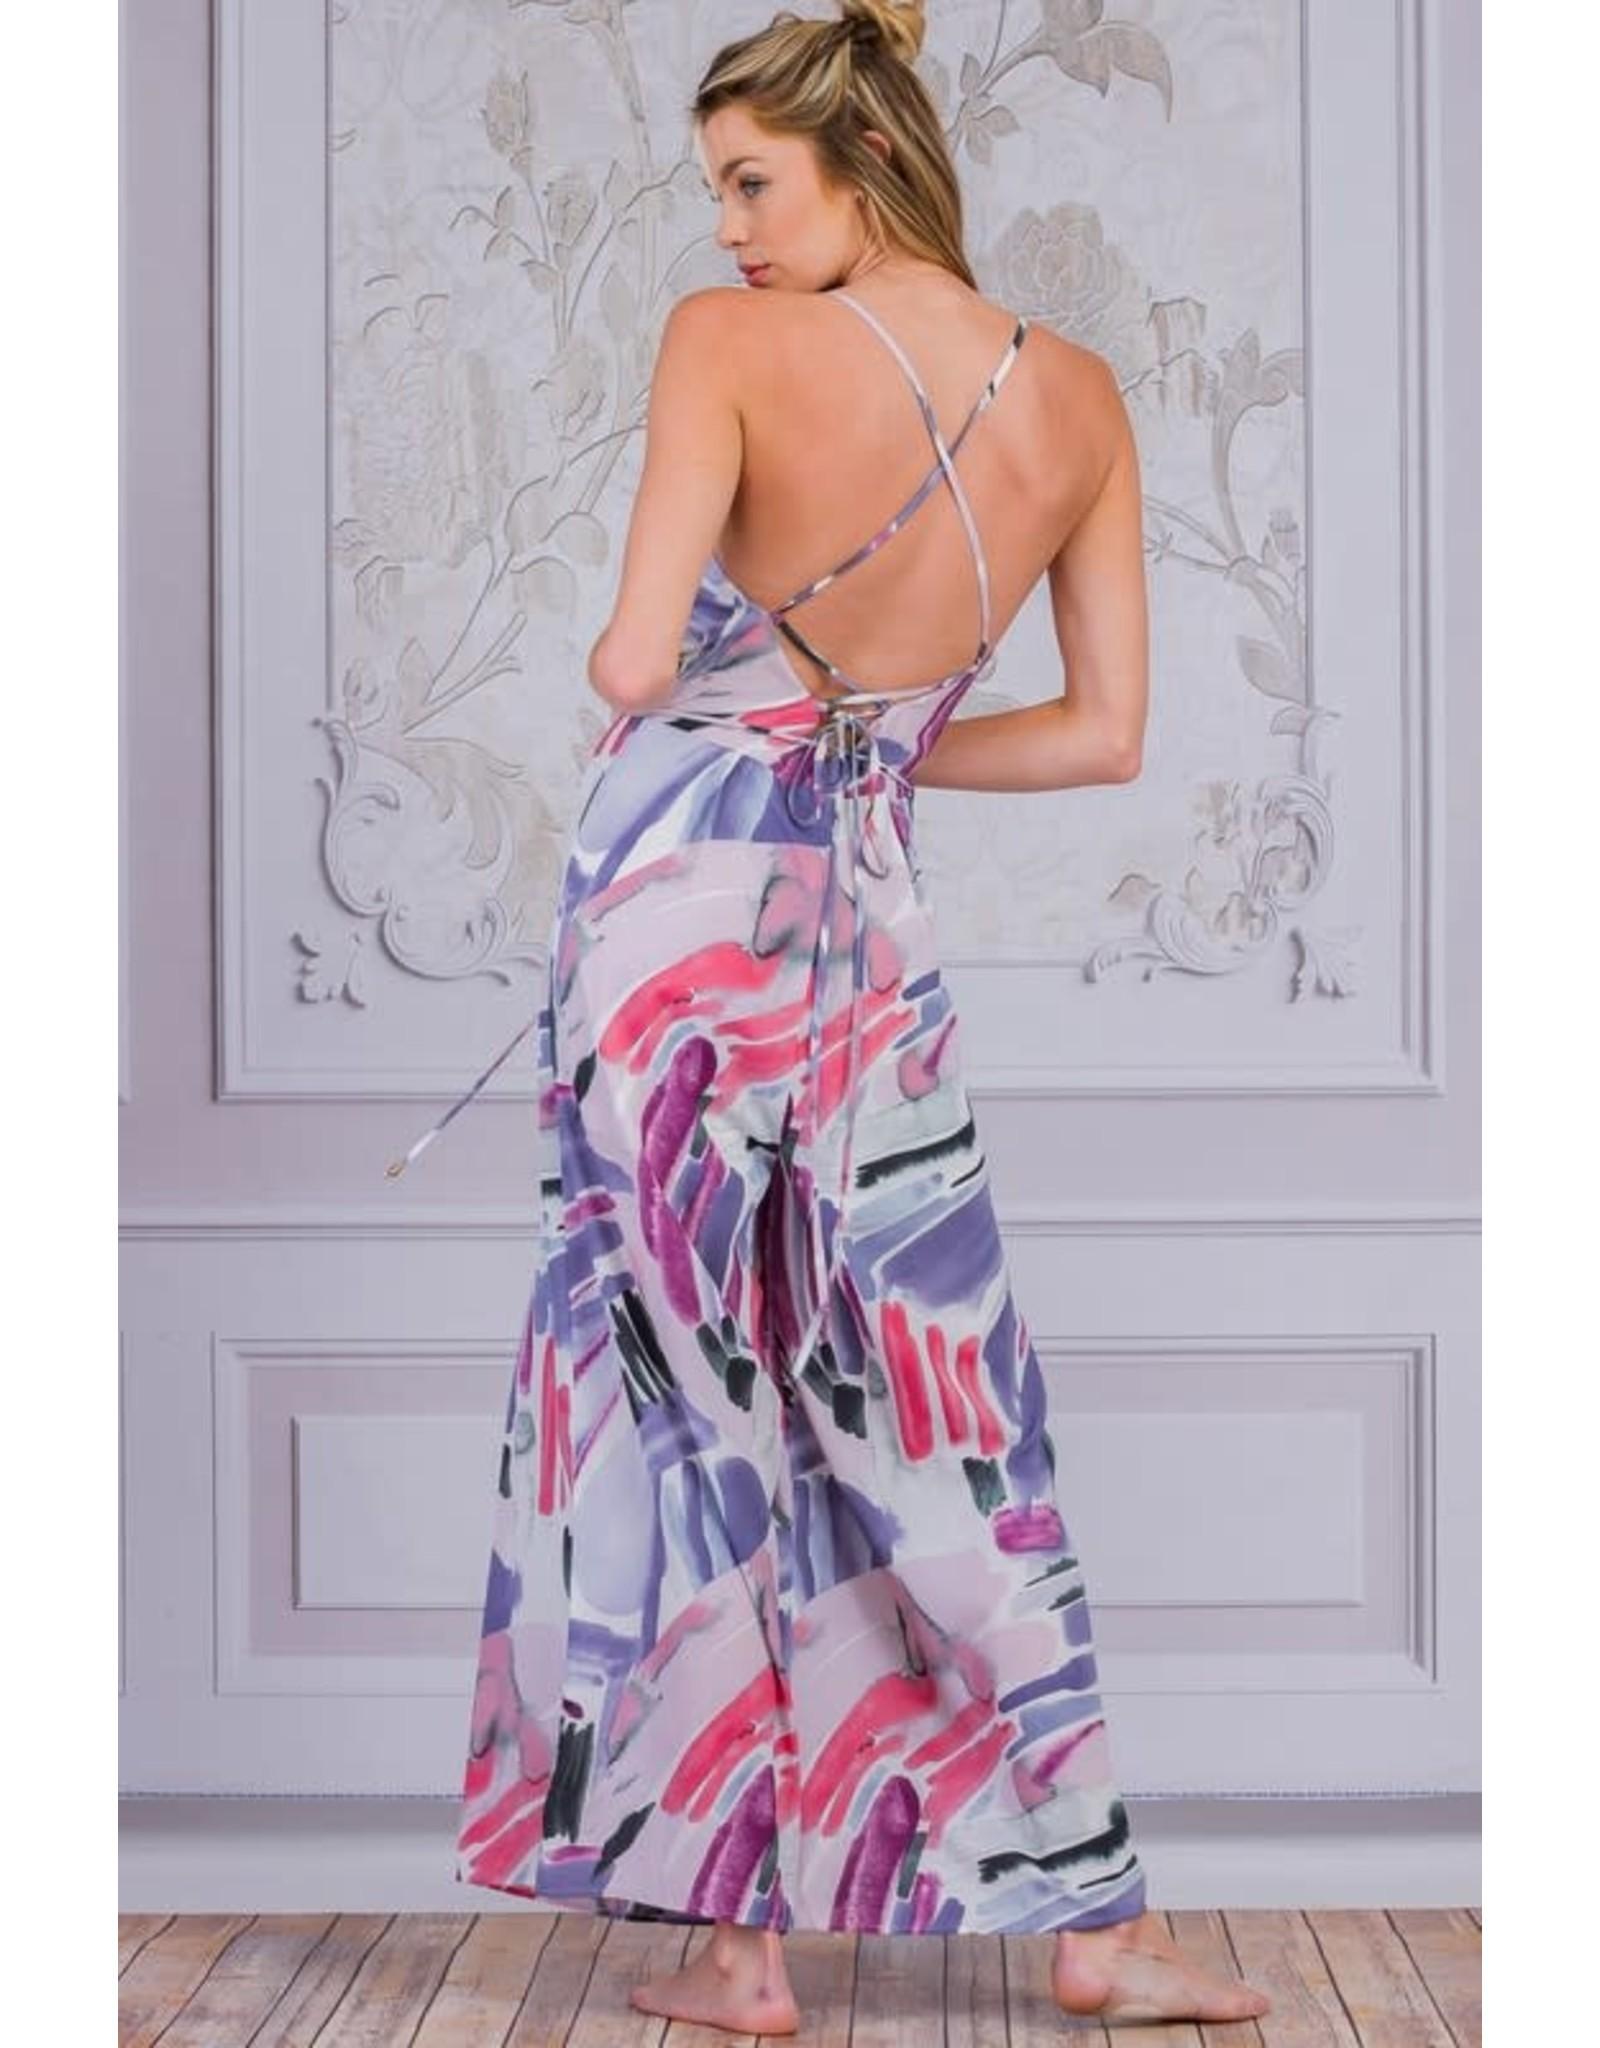 Ambition Leighton Lavender Jumpsuit